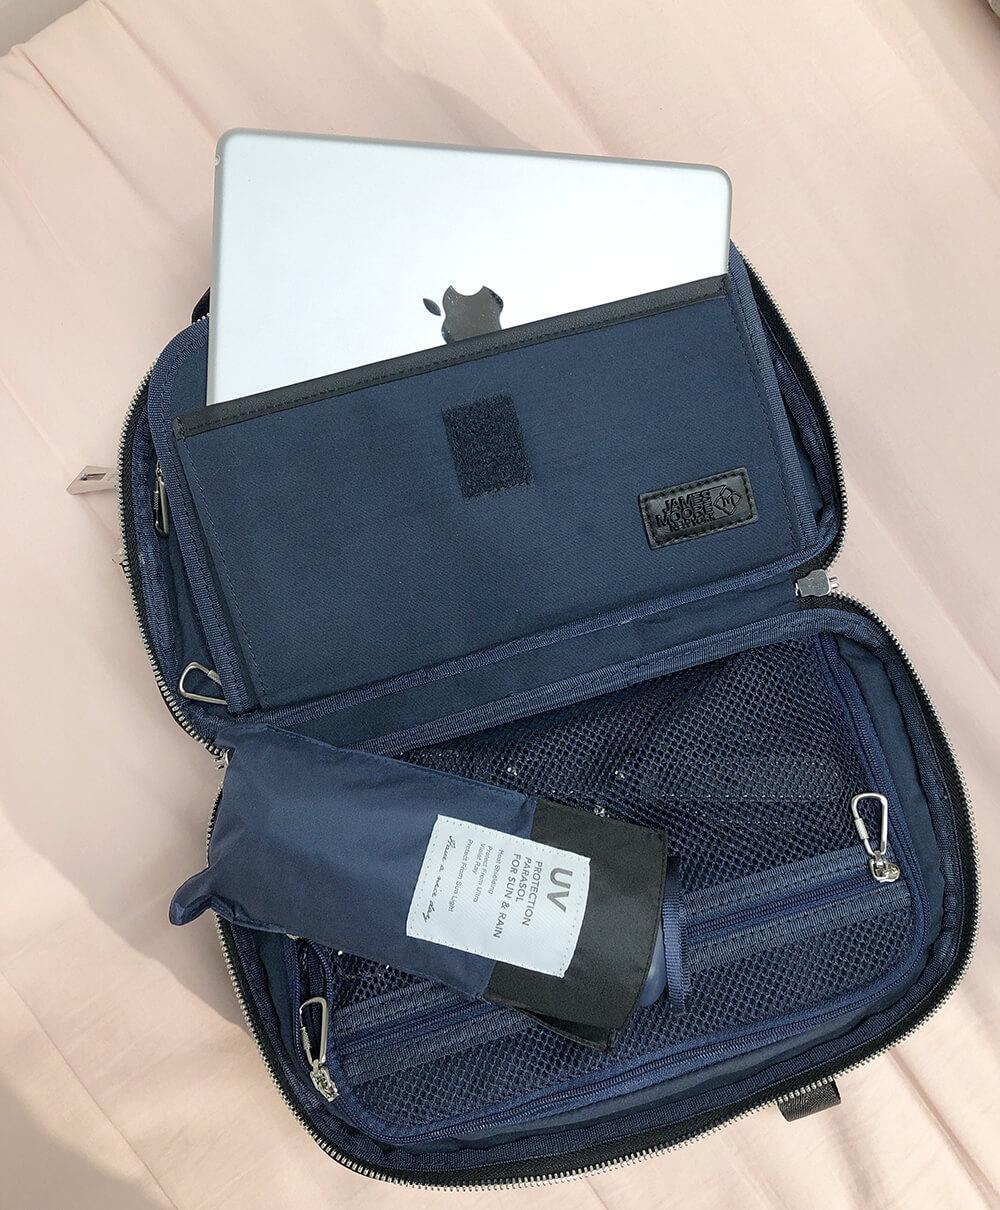 iPad mini compartment